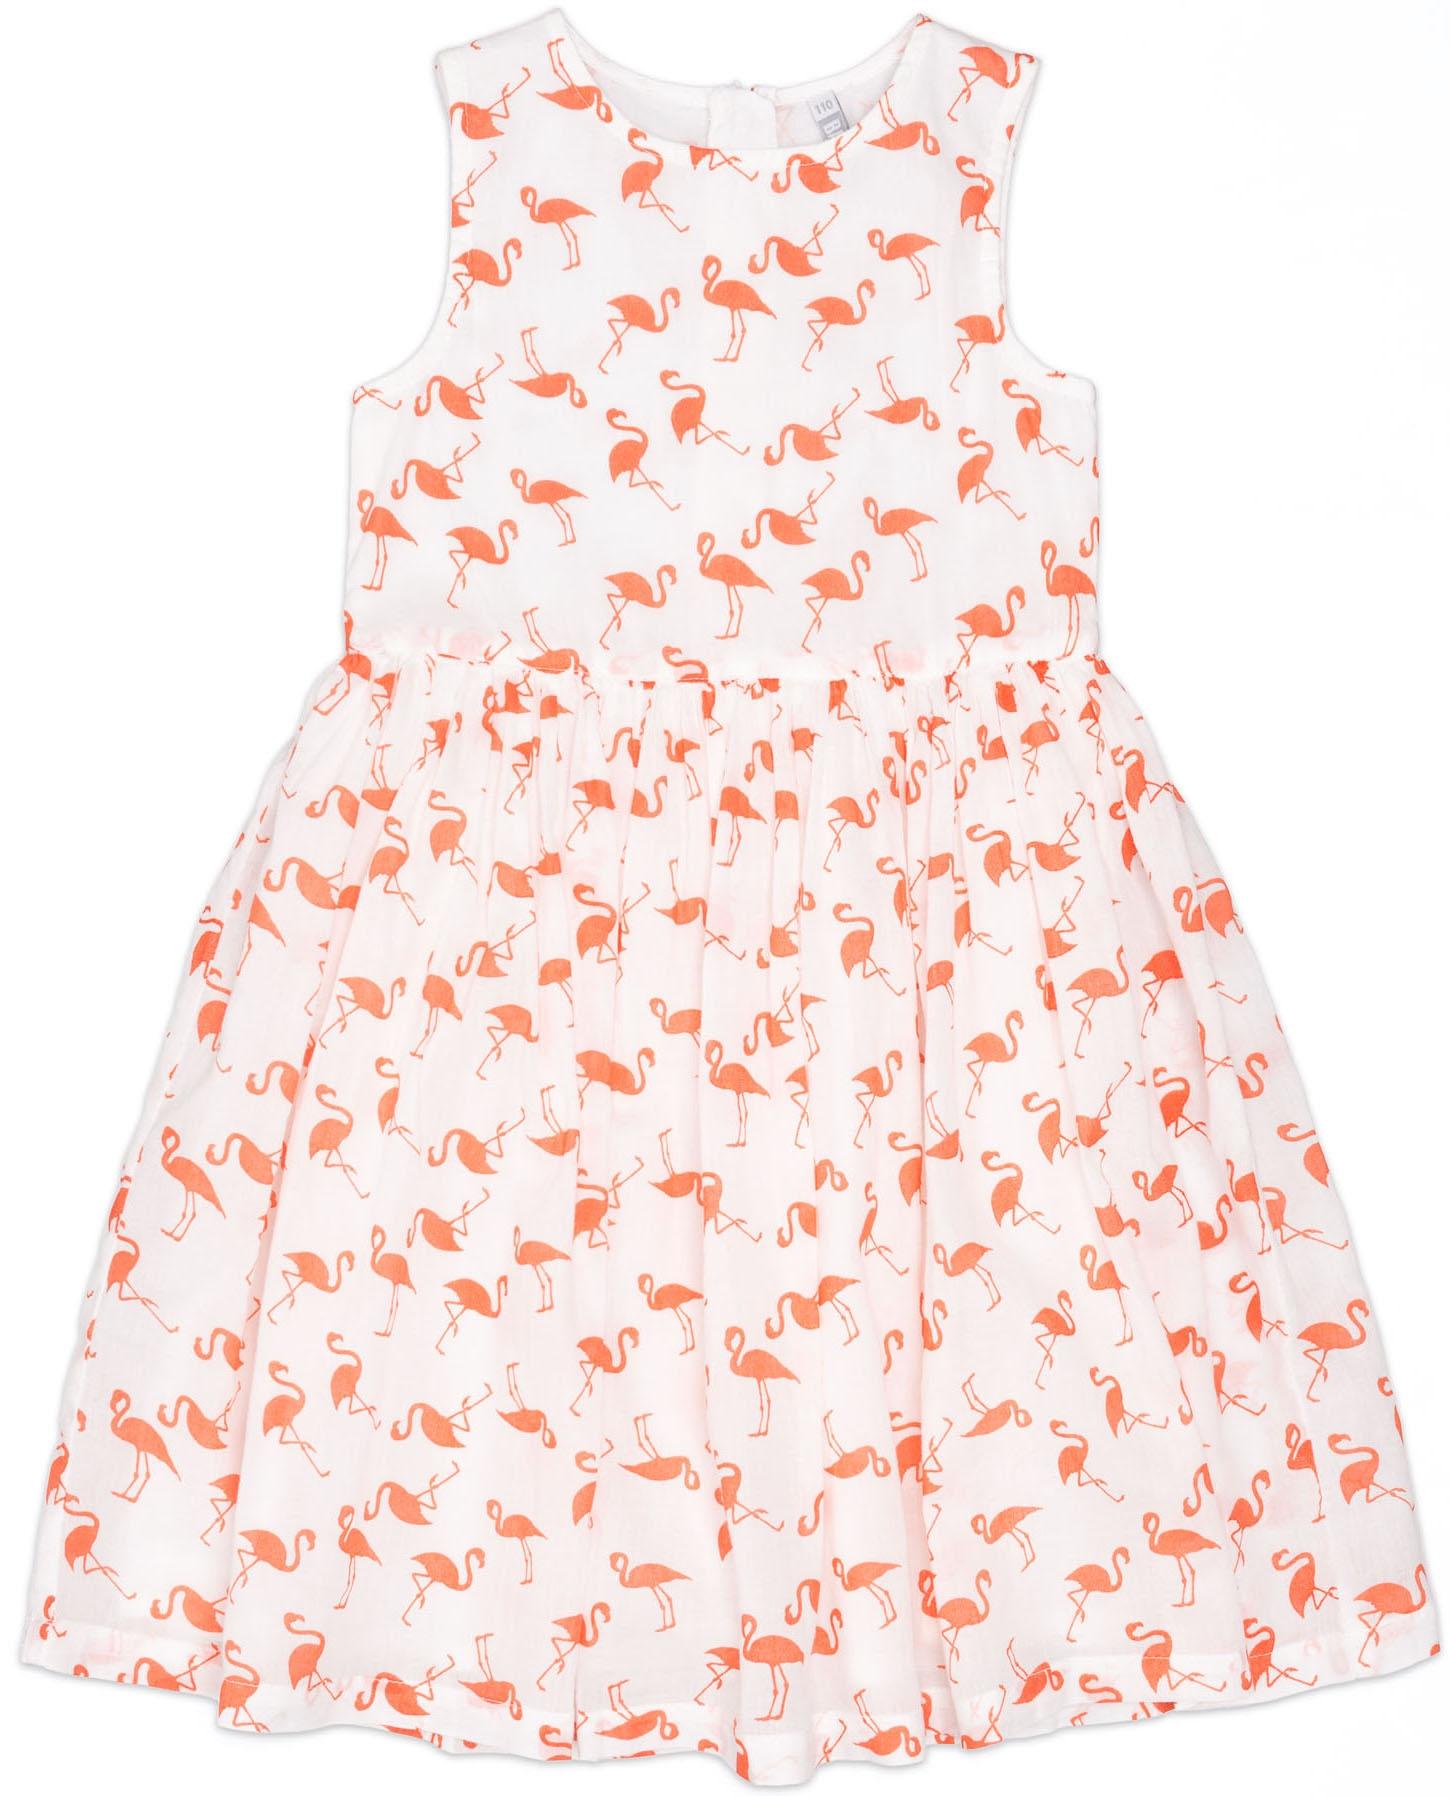 Платья Barkito Платье без рукавов Barkito, Фламинго, белое perlitta perlitta платье белое